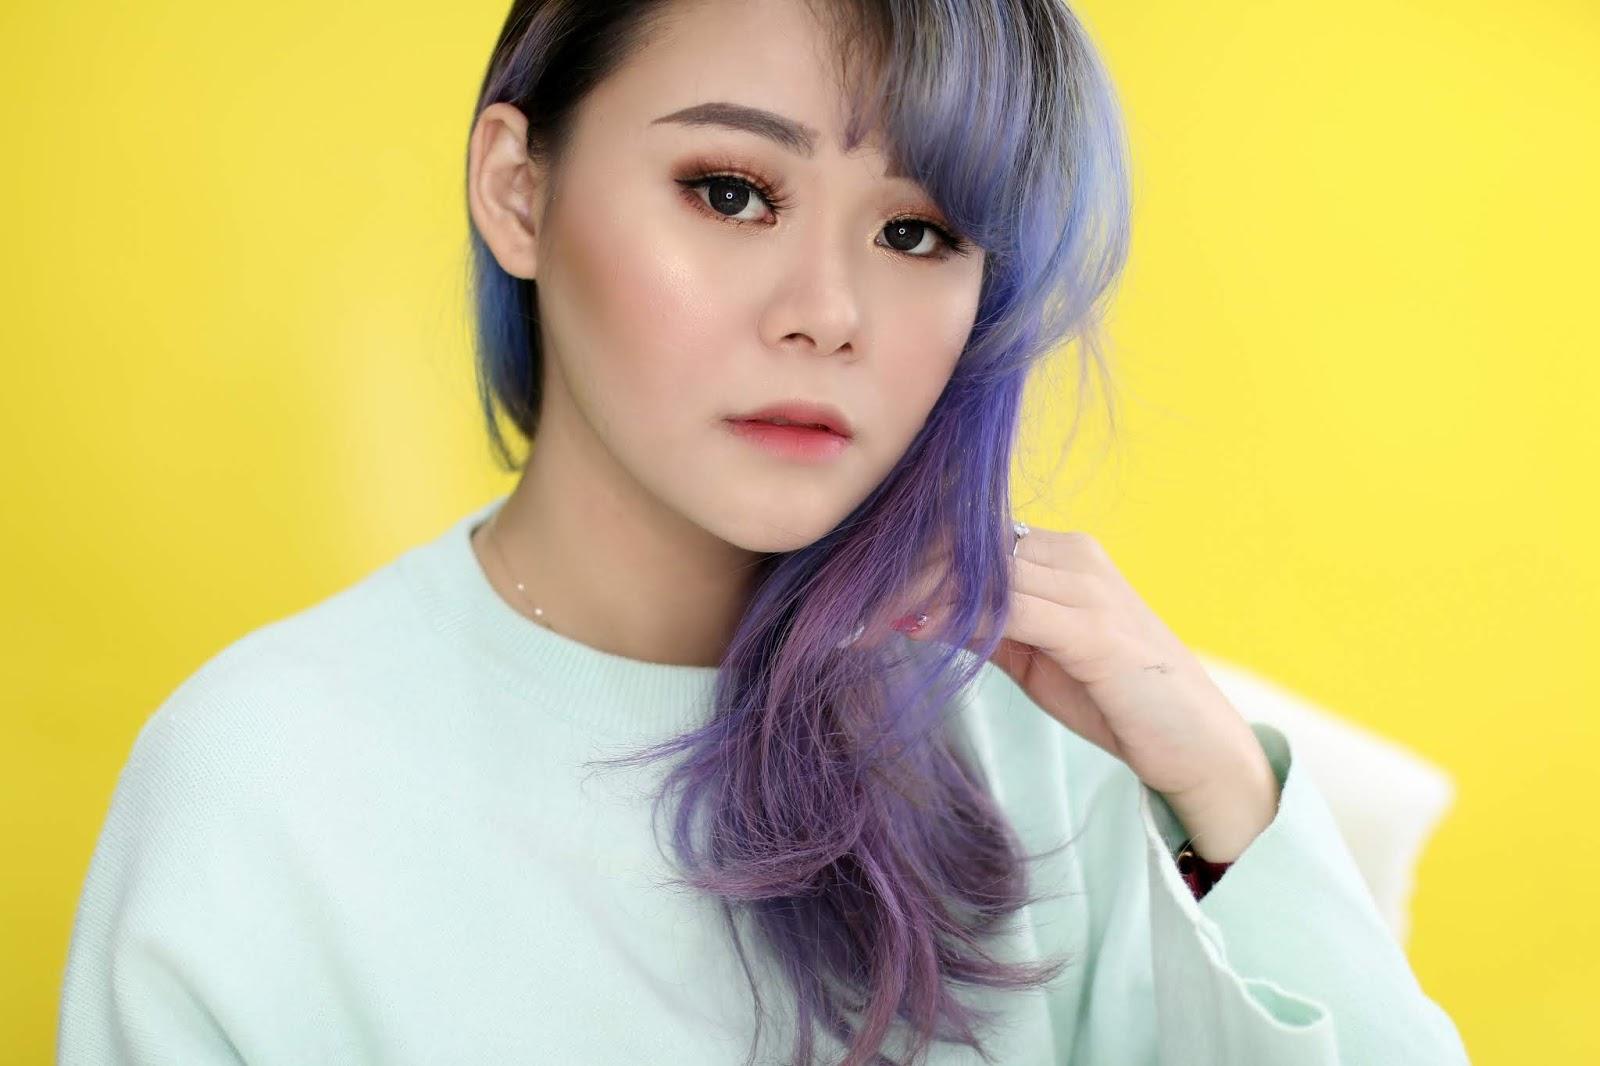 makeup tutorial, makeup, jean milka, indonesia beauty blogger, indo beauty gram, soft natural makeup, natural makeup, minuet palette tutorial